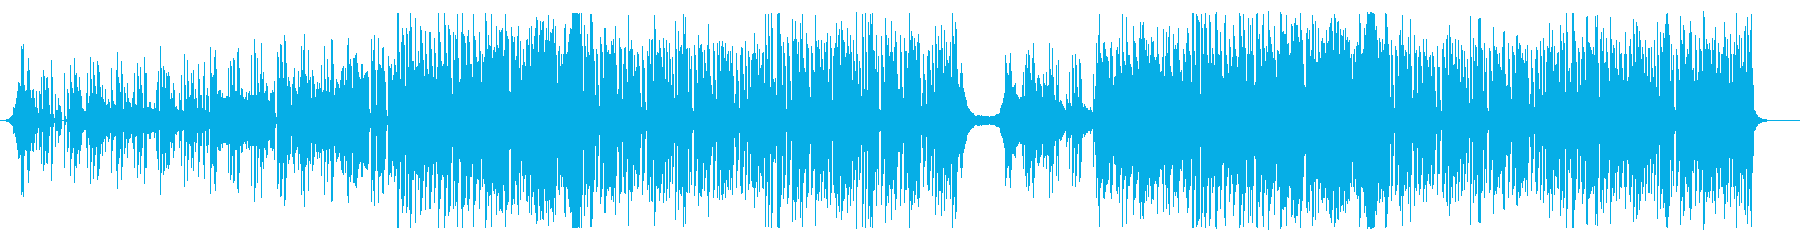 tropicalhouseの歌もの曲の再生済みの波形